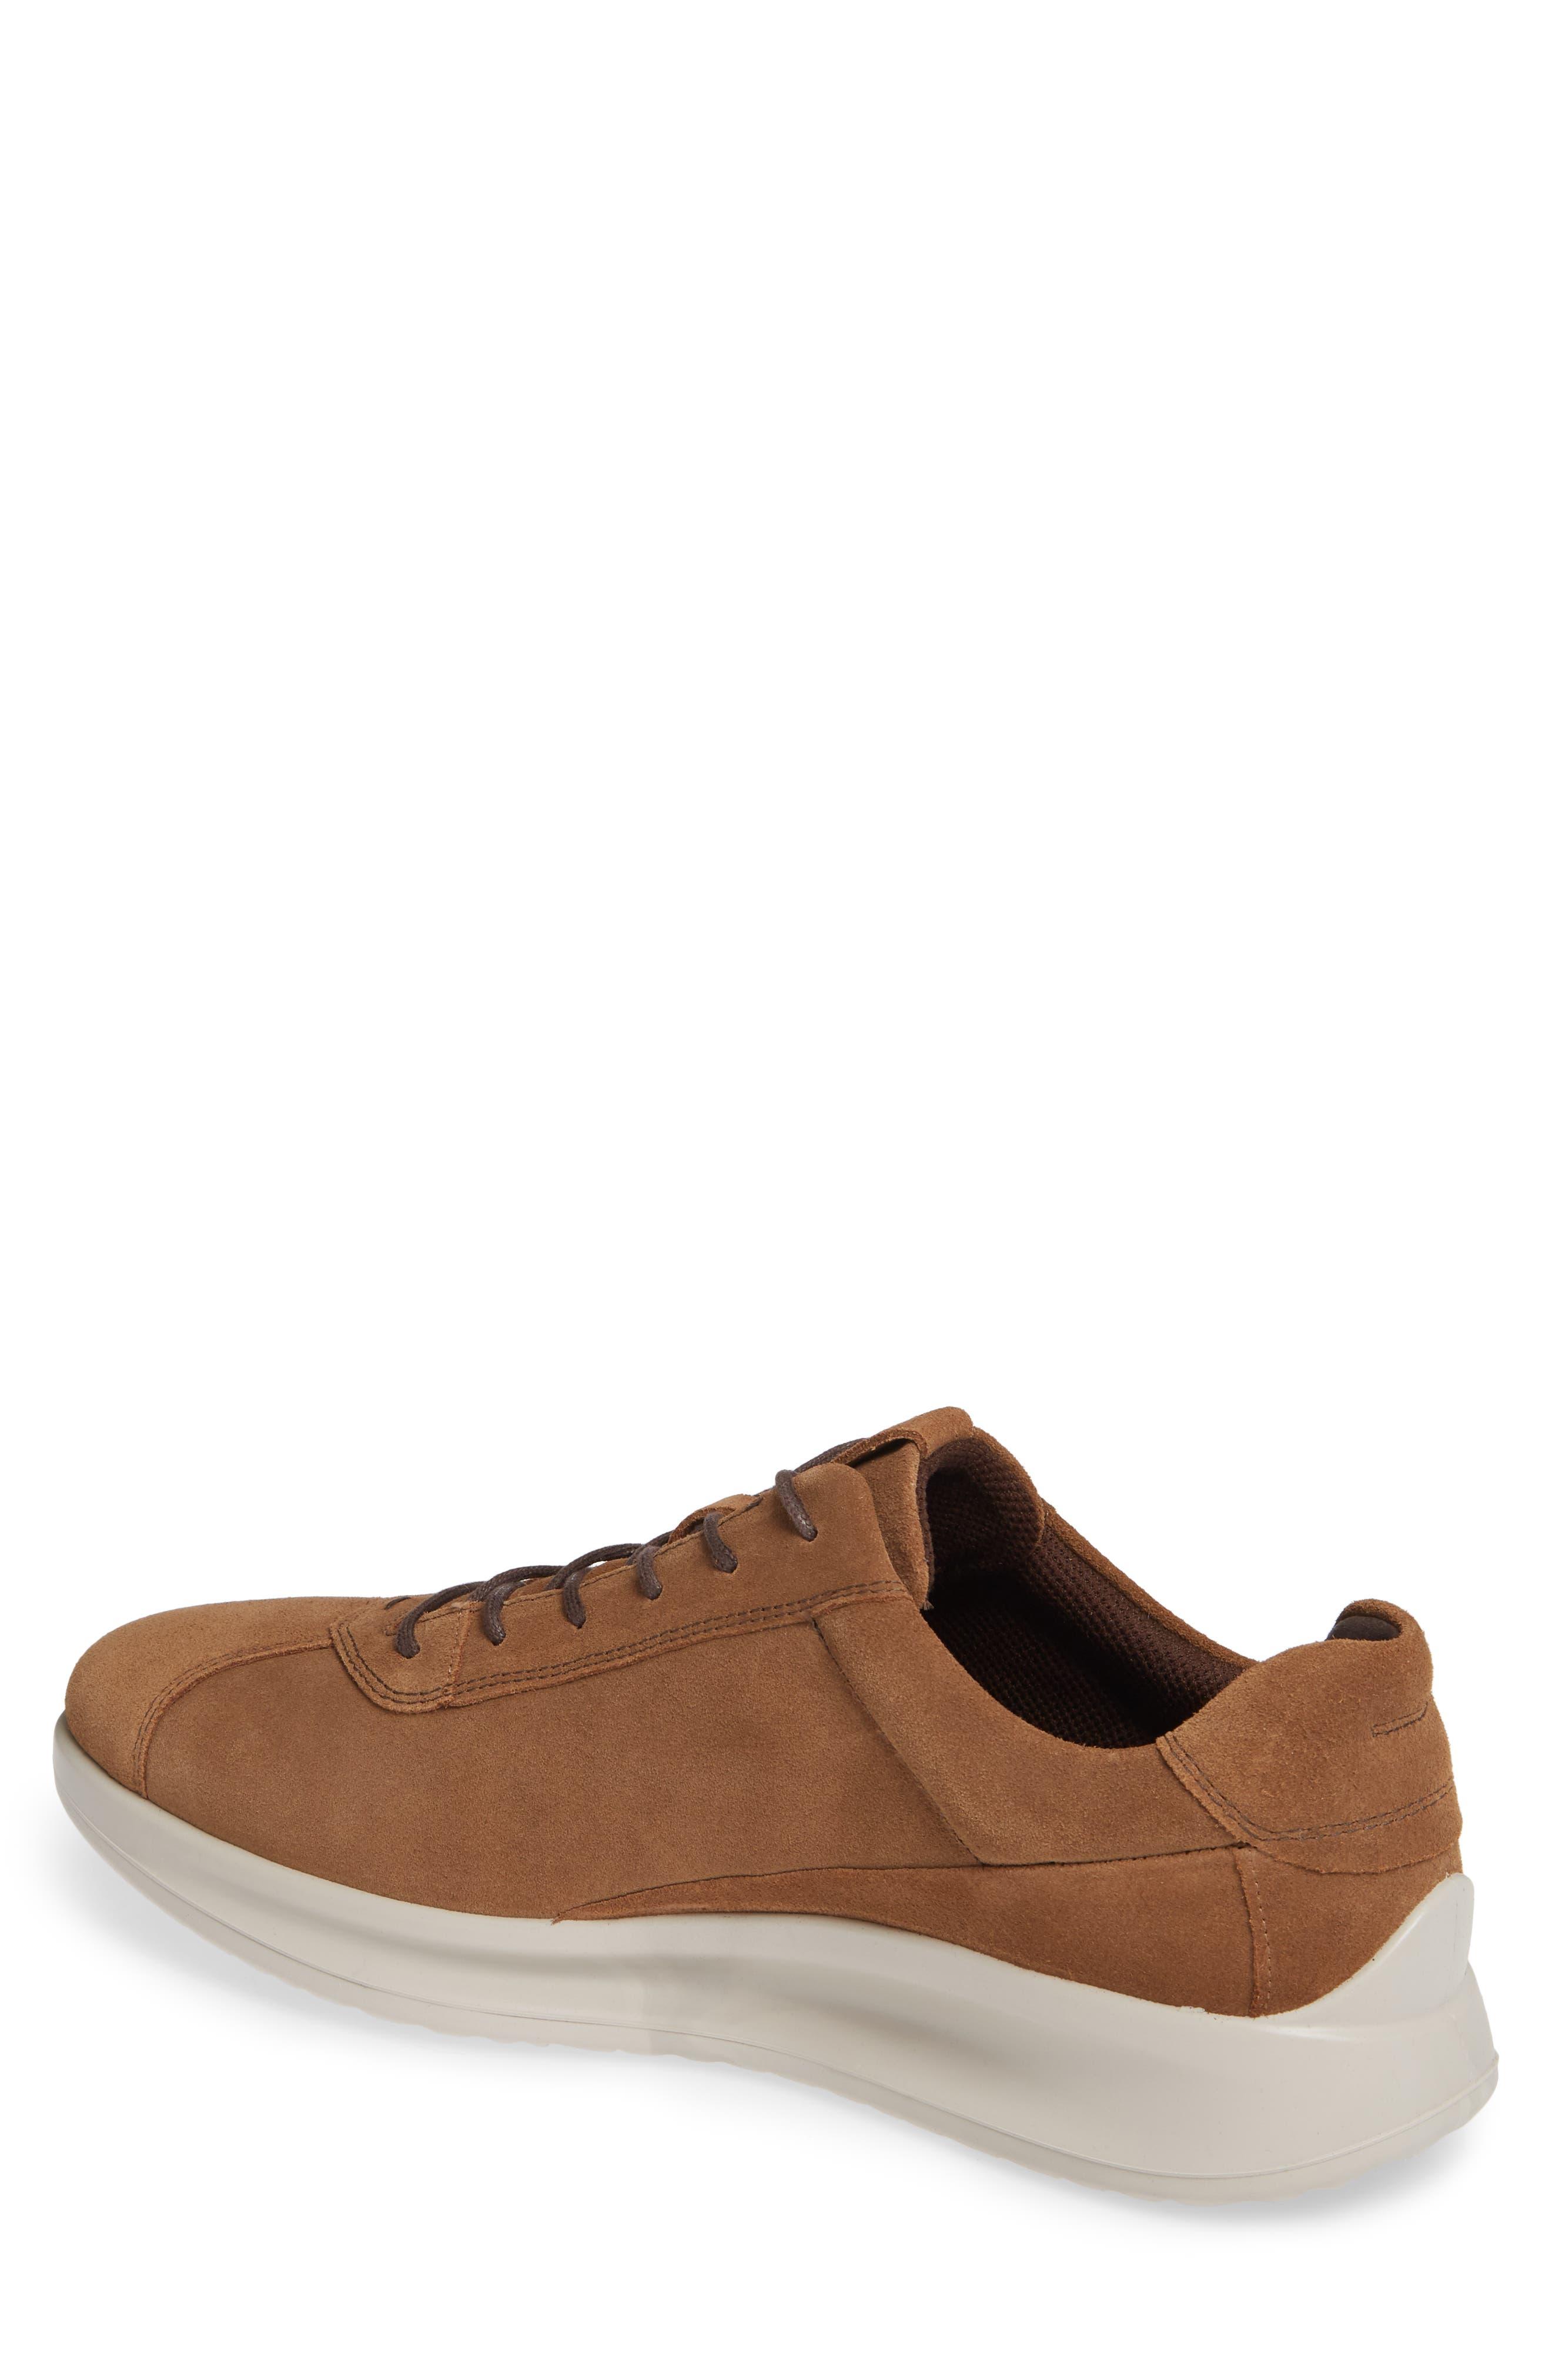 Vitrus Aquet Sneaker,                             Alternate thumbnail 2, color,                             204